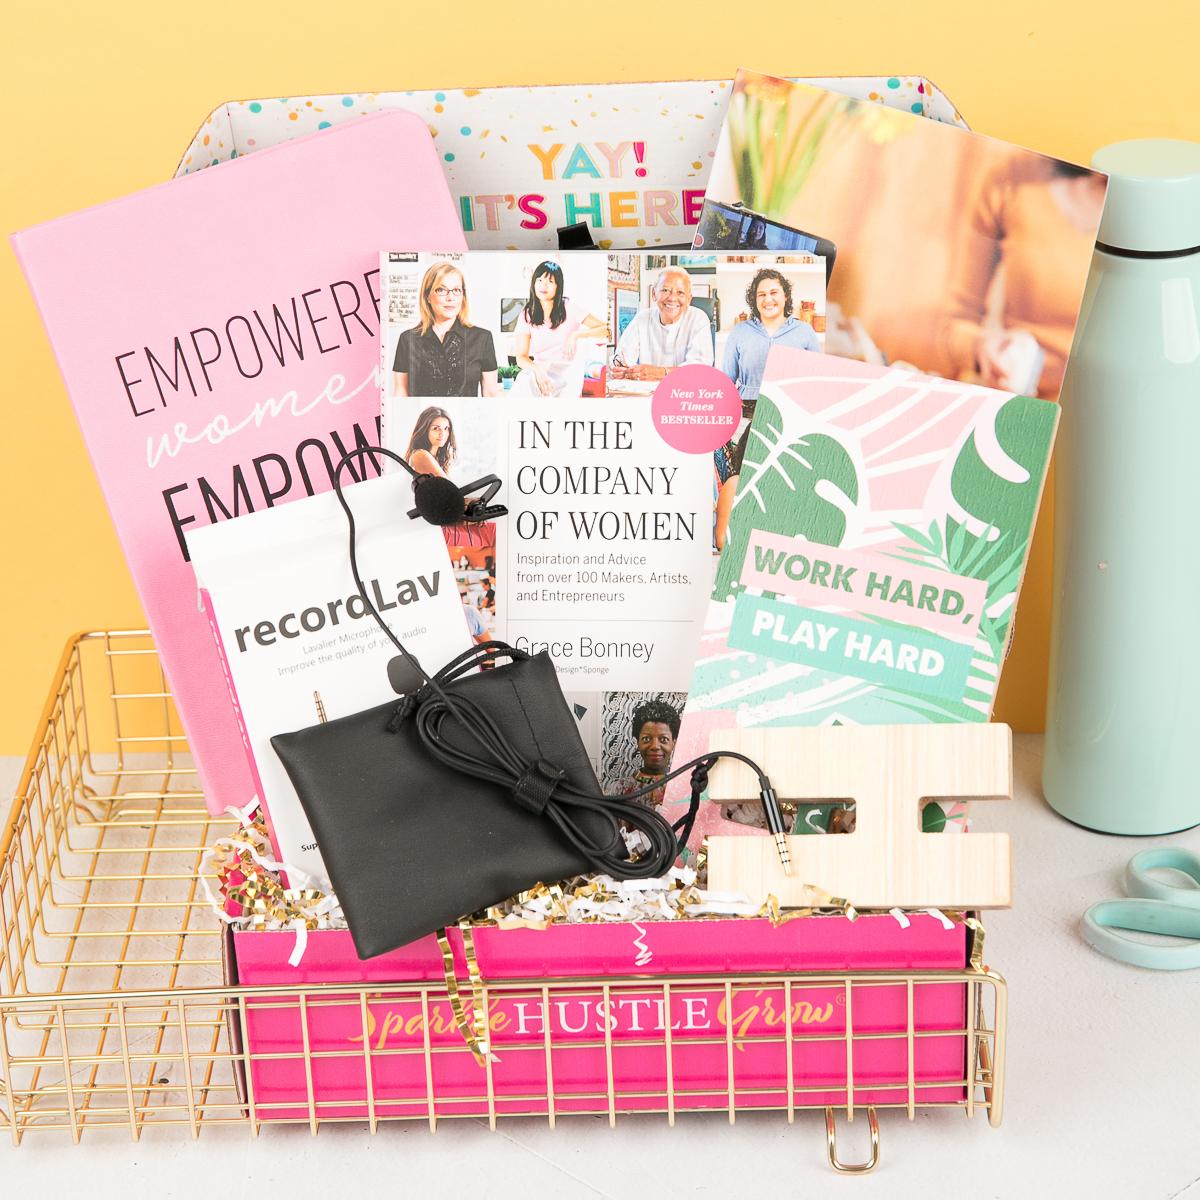 July 2021 Sparkle Hustle Grow box